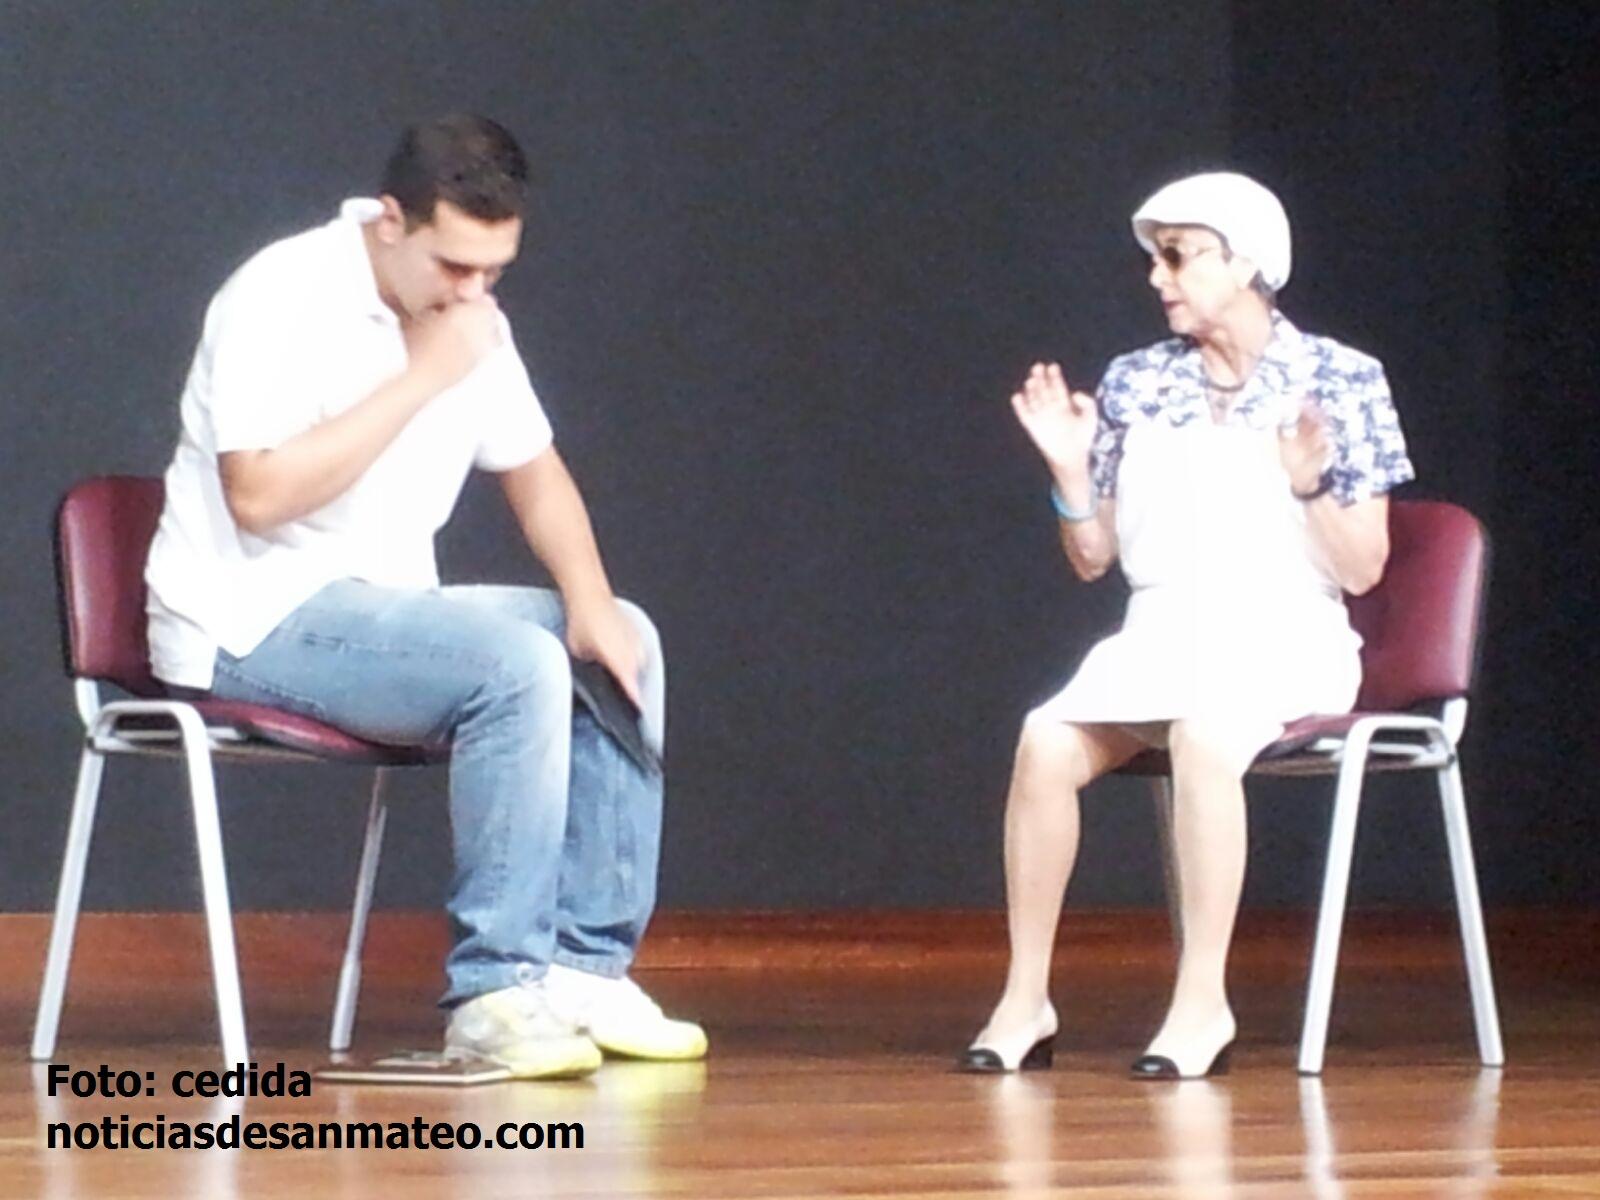 Ensalada de teatro 3 de octubre de 2015 Foto Laura Miranda 2